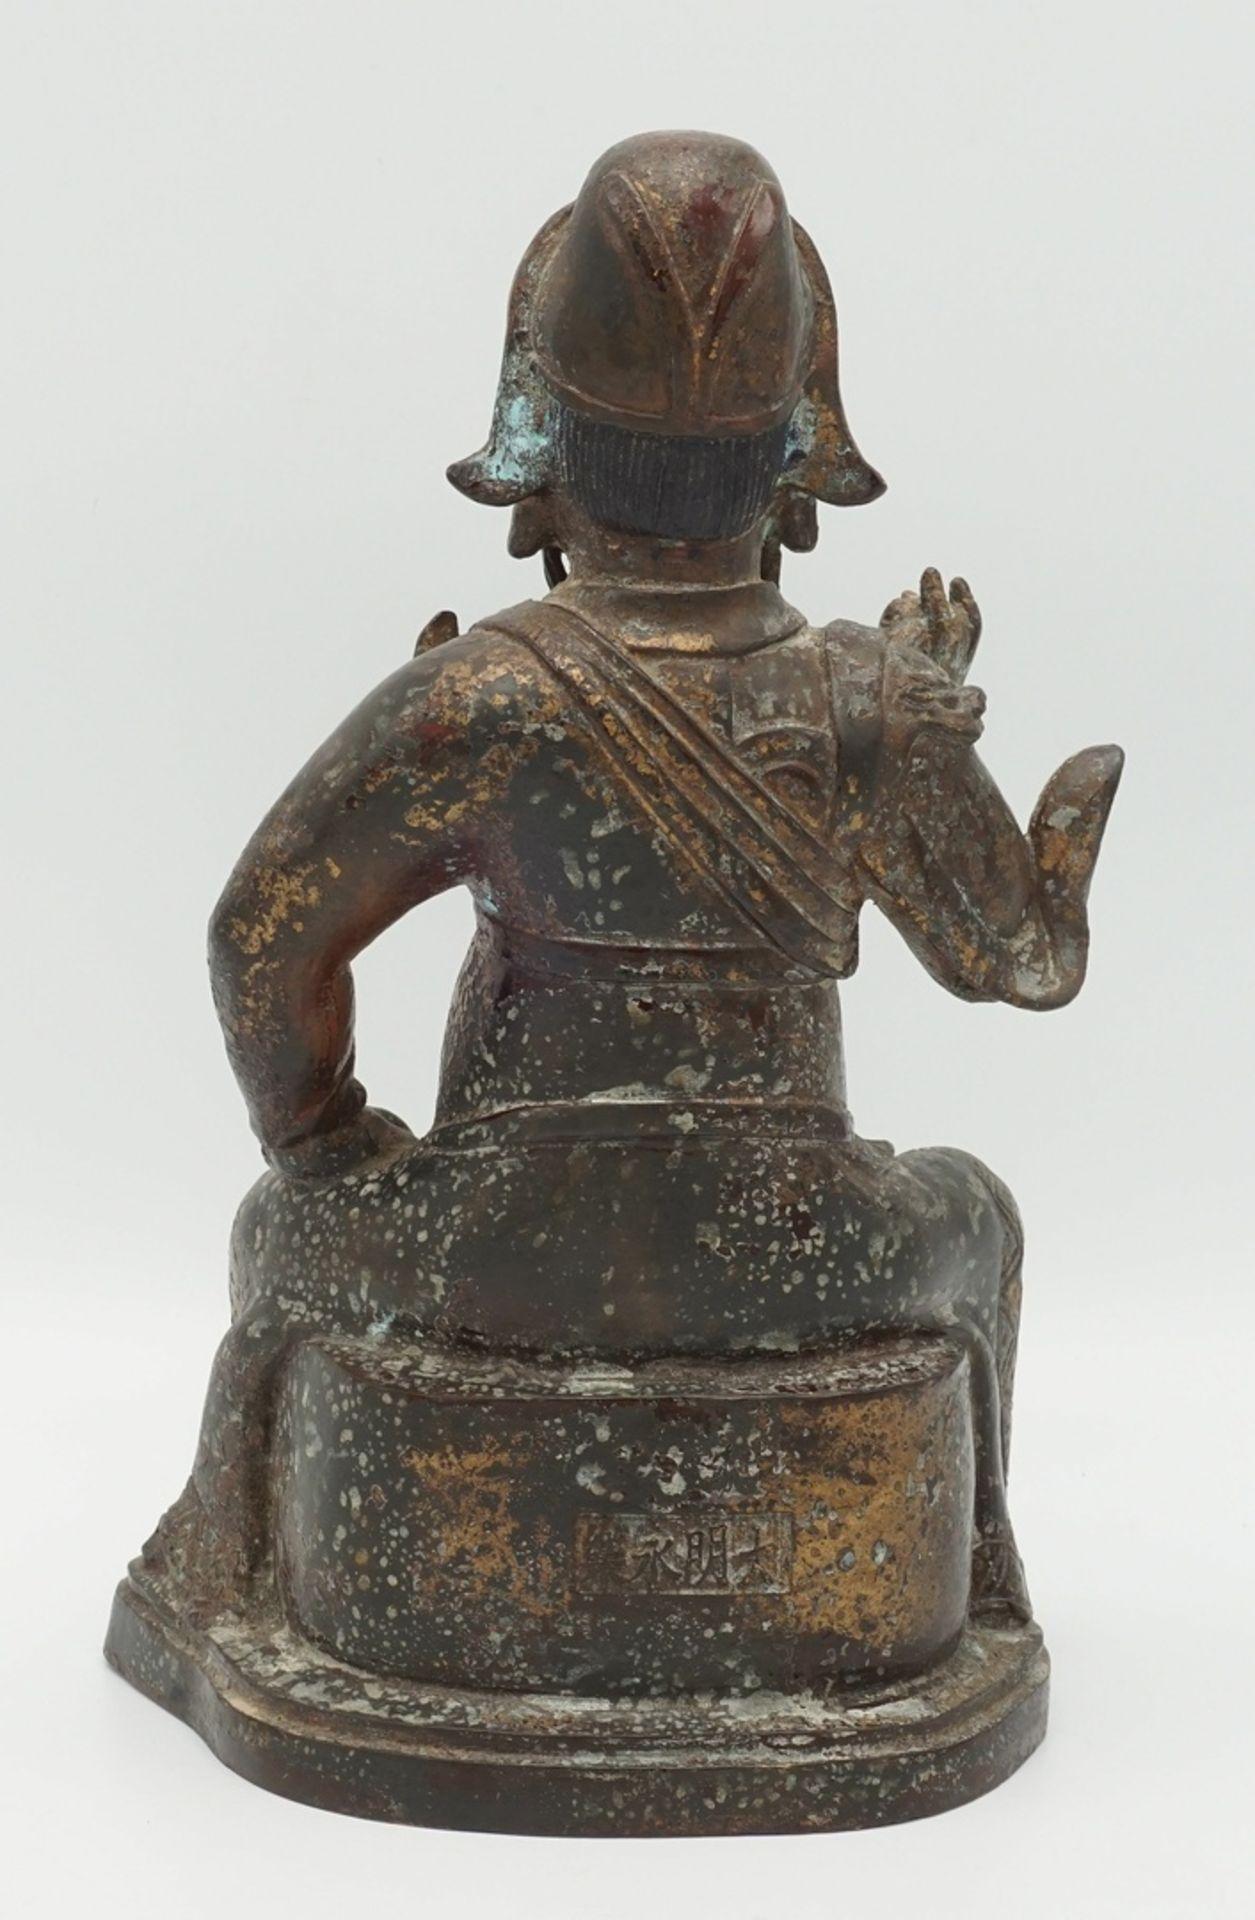 Guan Yu Bronzefigur, China, 18./19. Jh. - Bild 2 aus 4